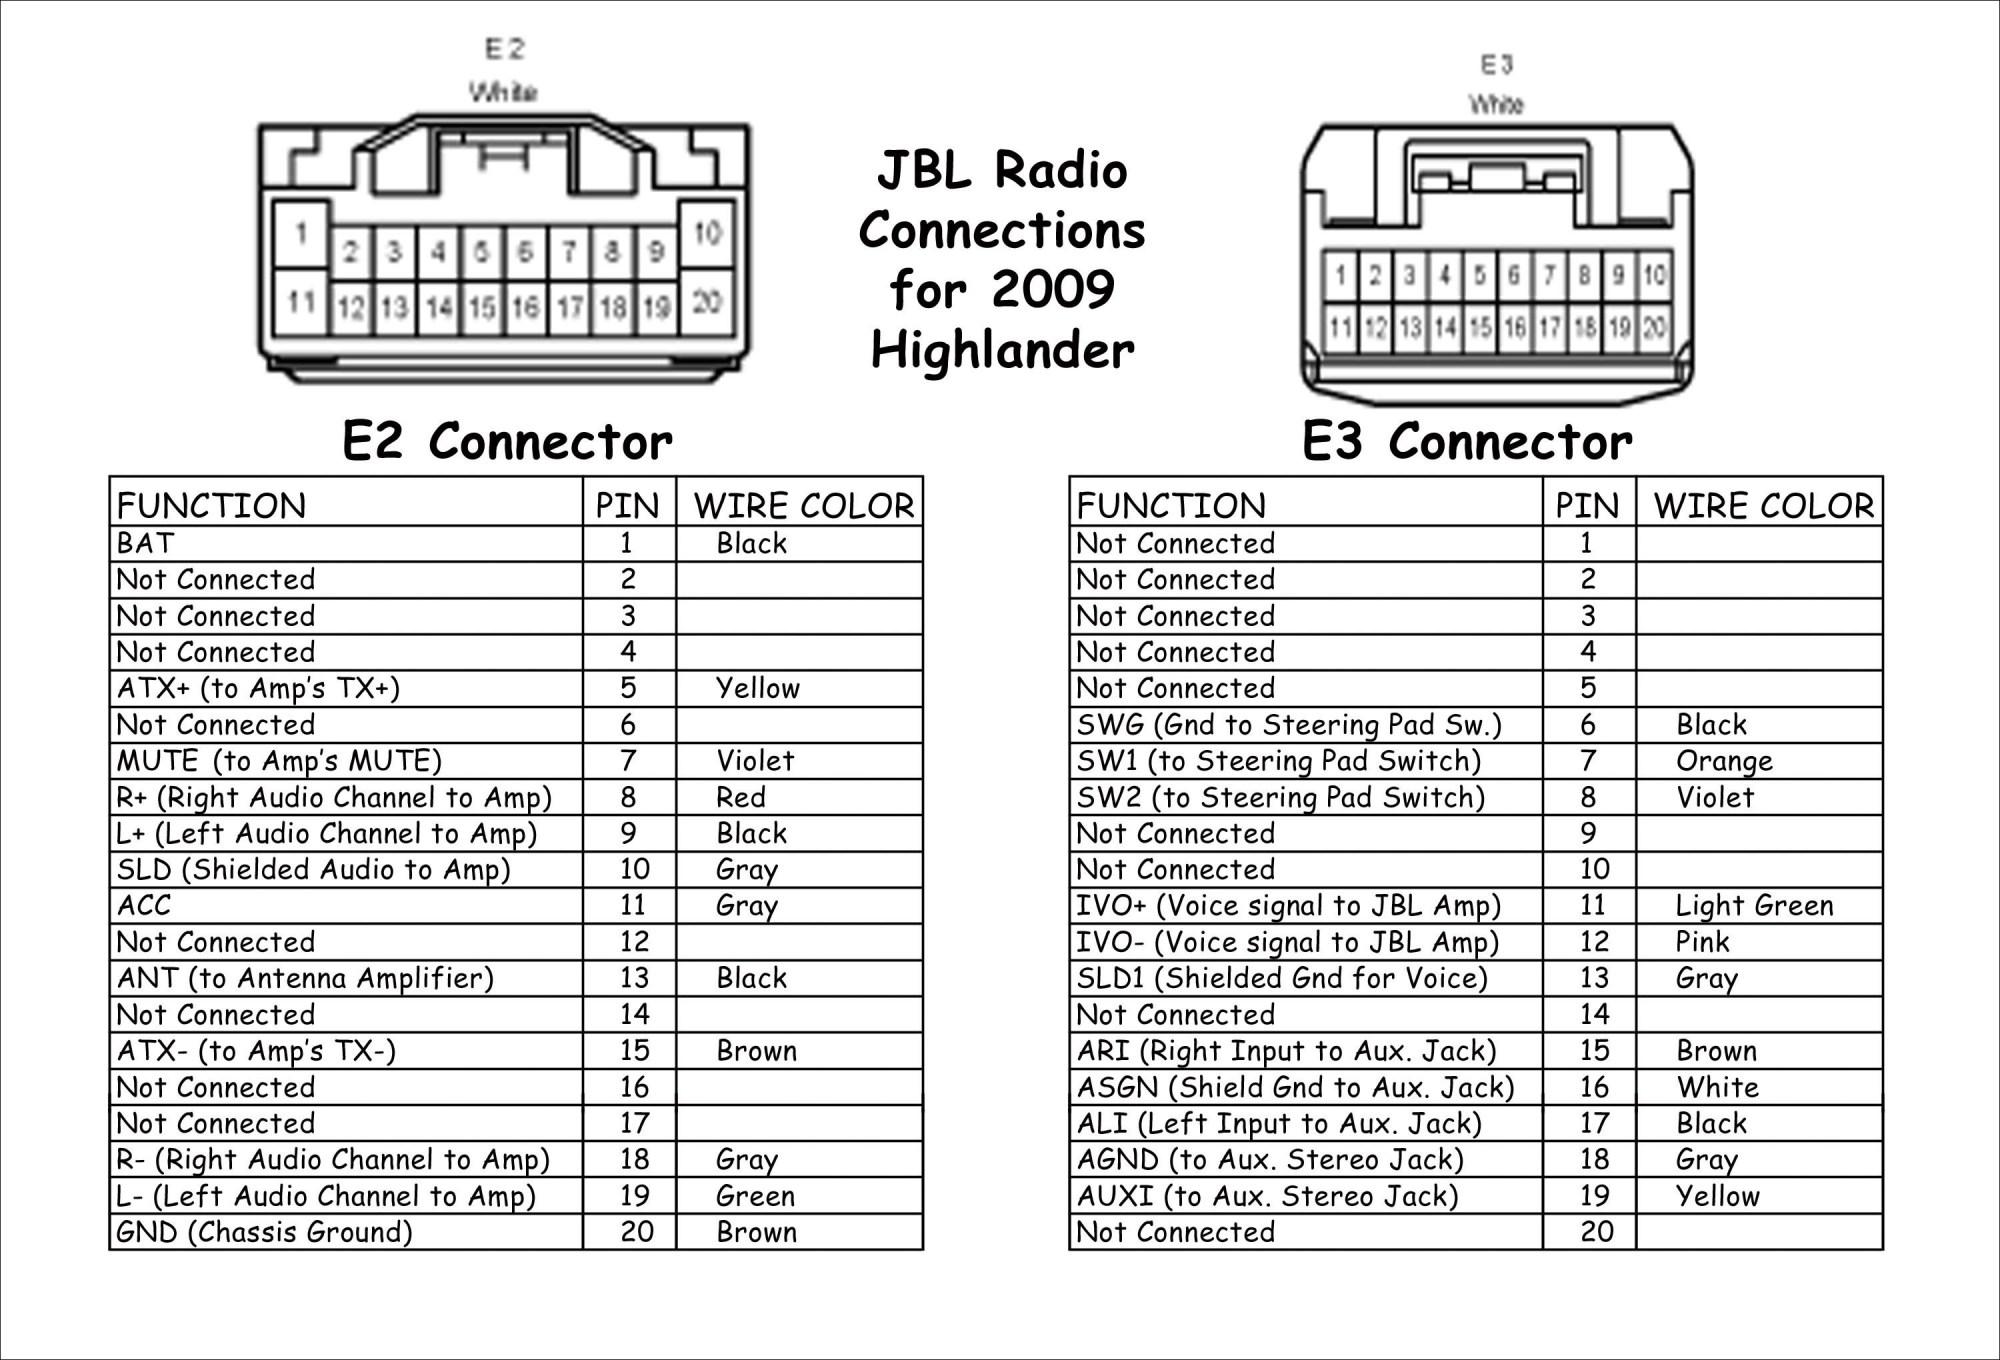 hight resolution of toyota 86120 52530 wiring diagram automotive wiring diagrams 2000 camry radio wiring diagram toyota 86120 0c030